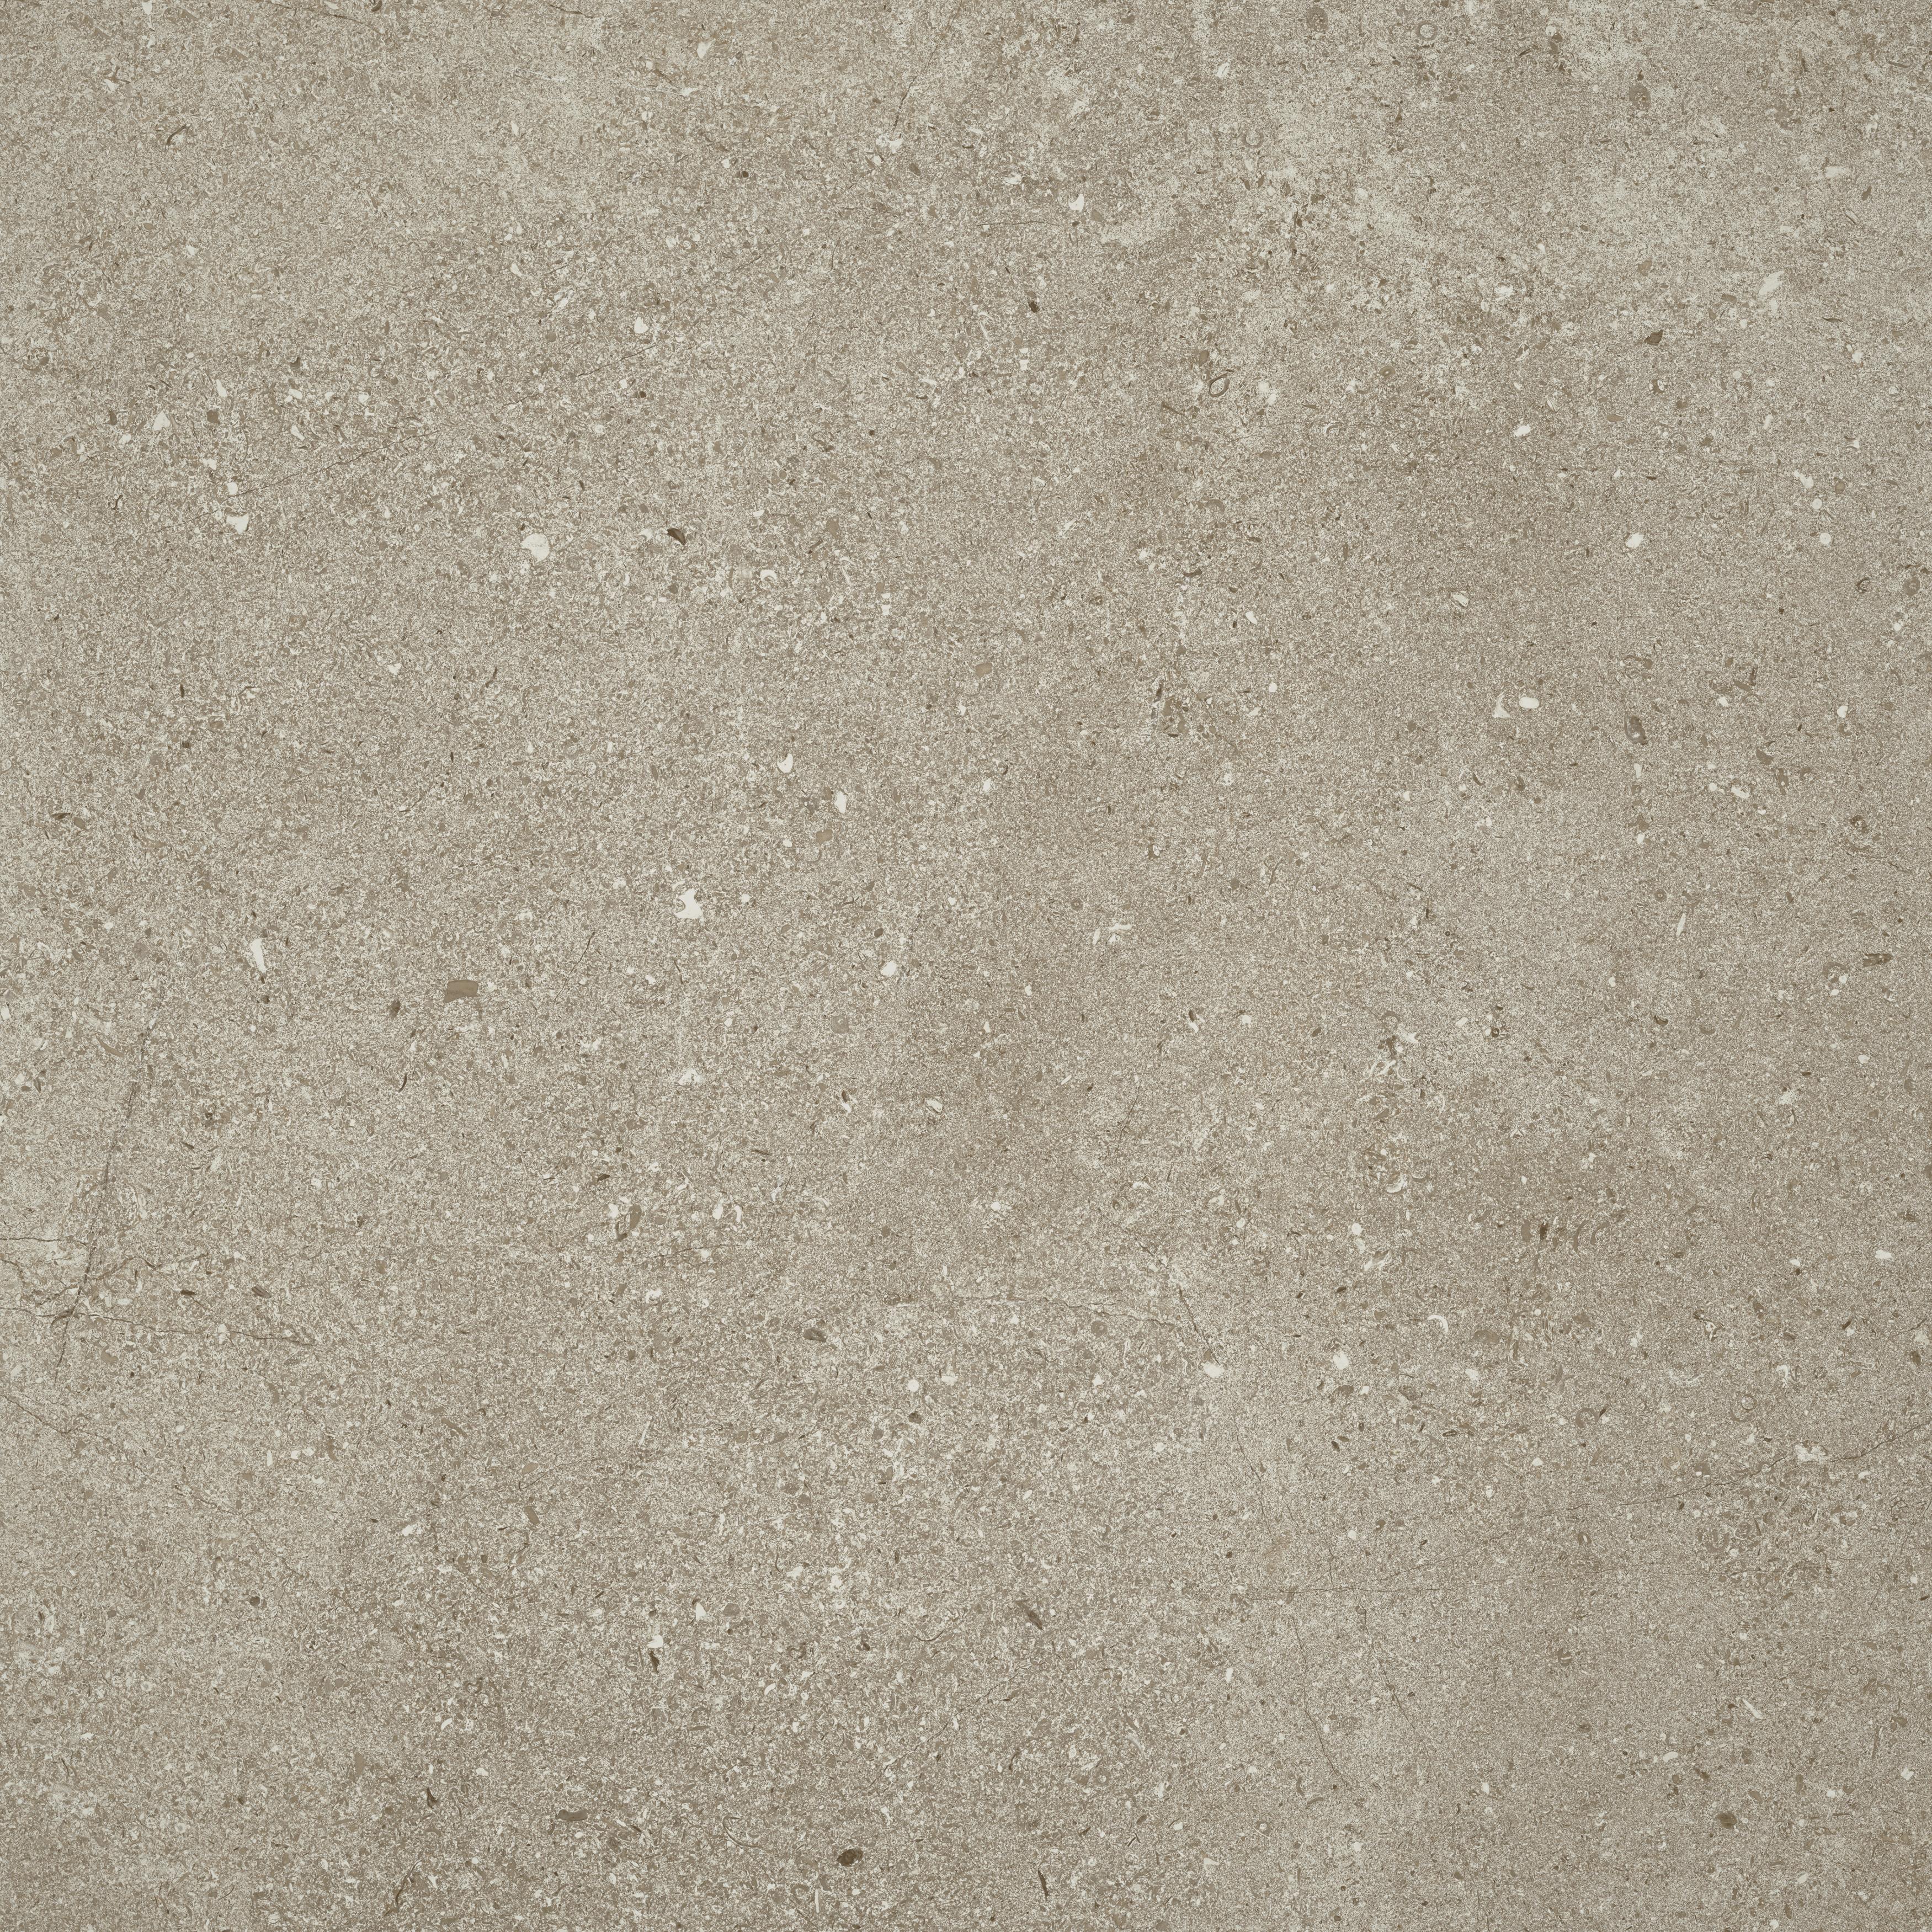 beige Steinoptik Fliese, beige stone effect tile 100x100